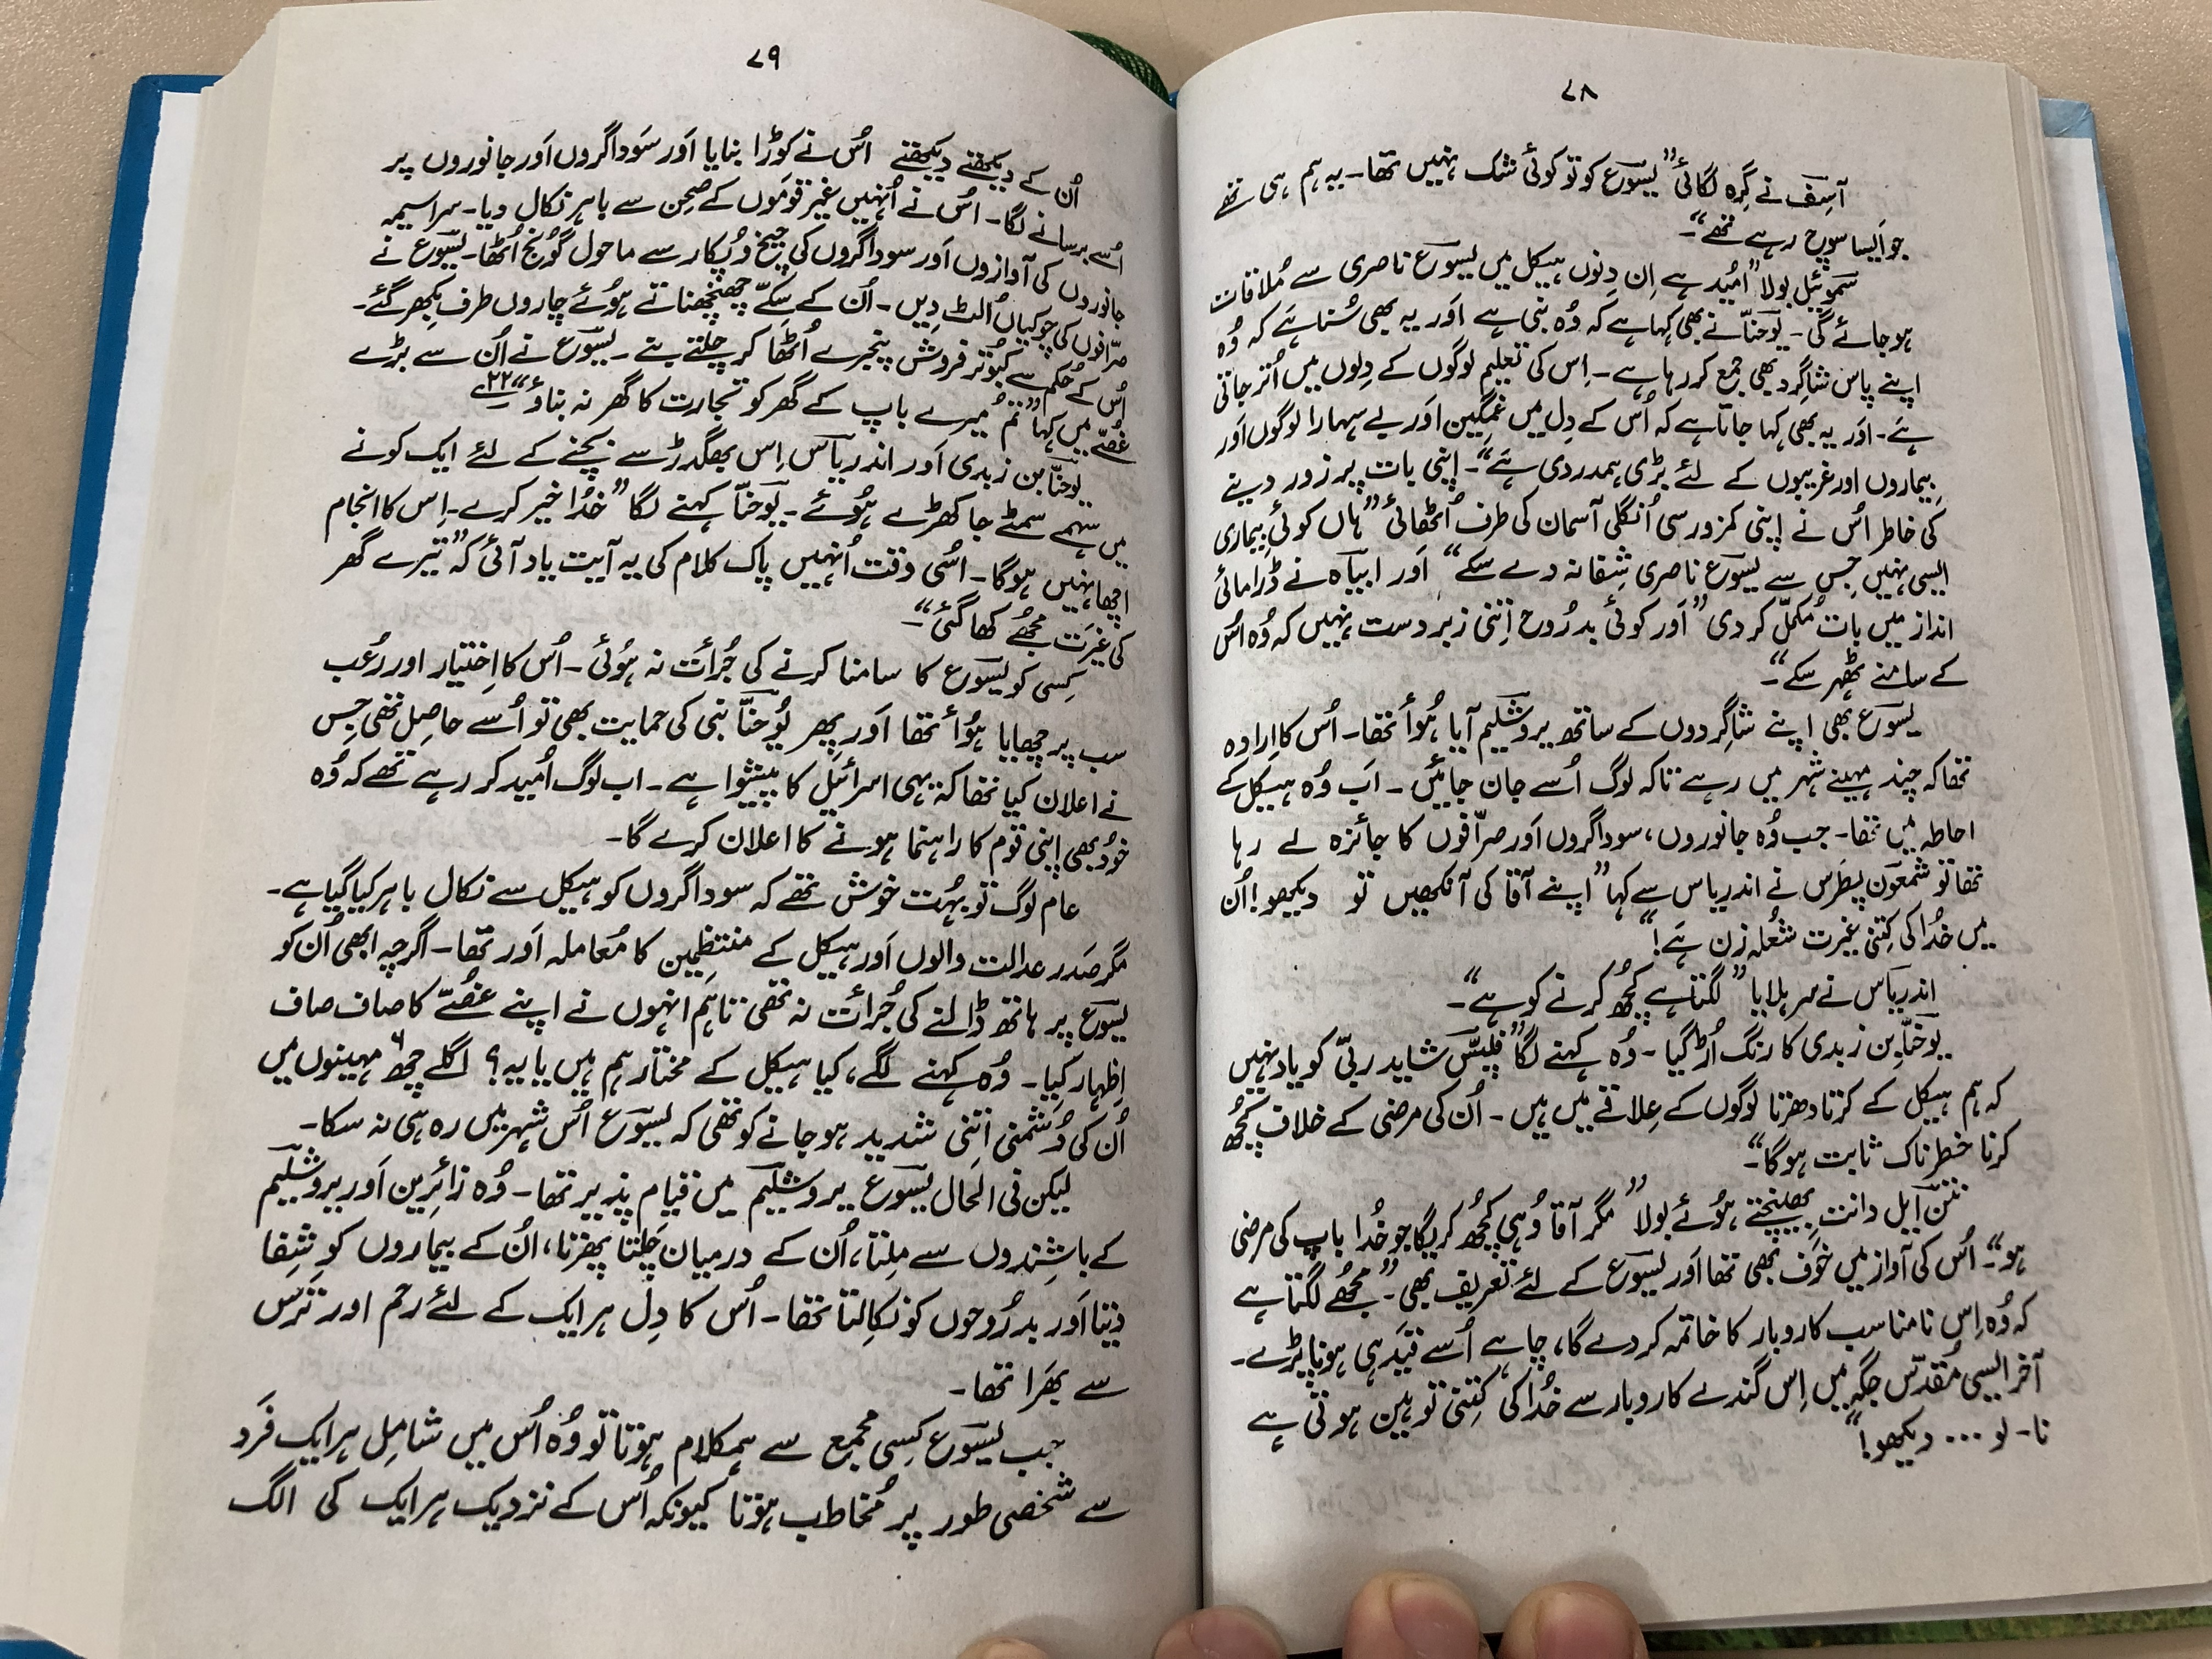 christ-the-conqueror-by-r.-becht-in-urdu-language-hardcover-2014-masihi-isha-at-khana-8-.jpg